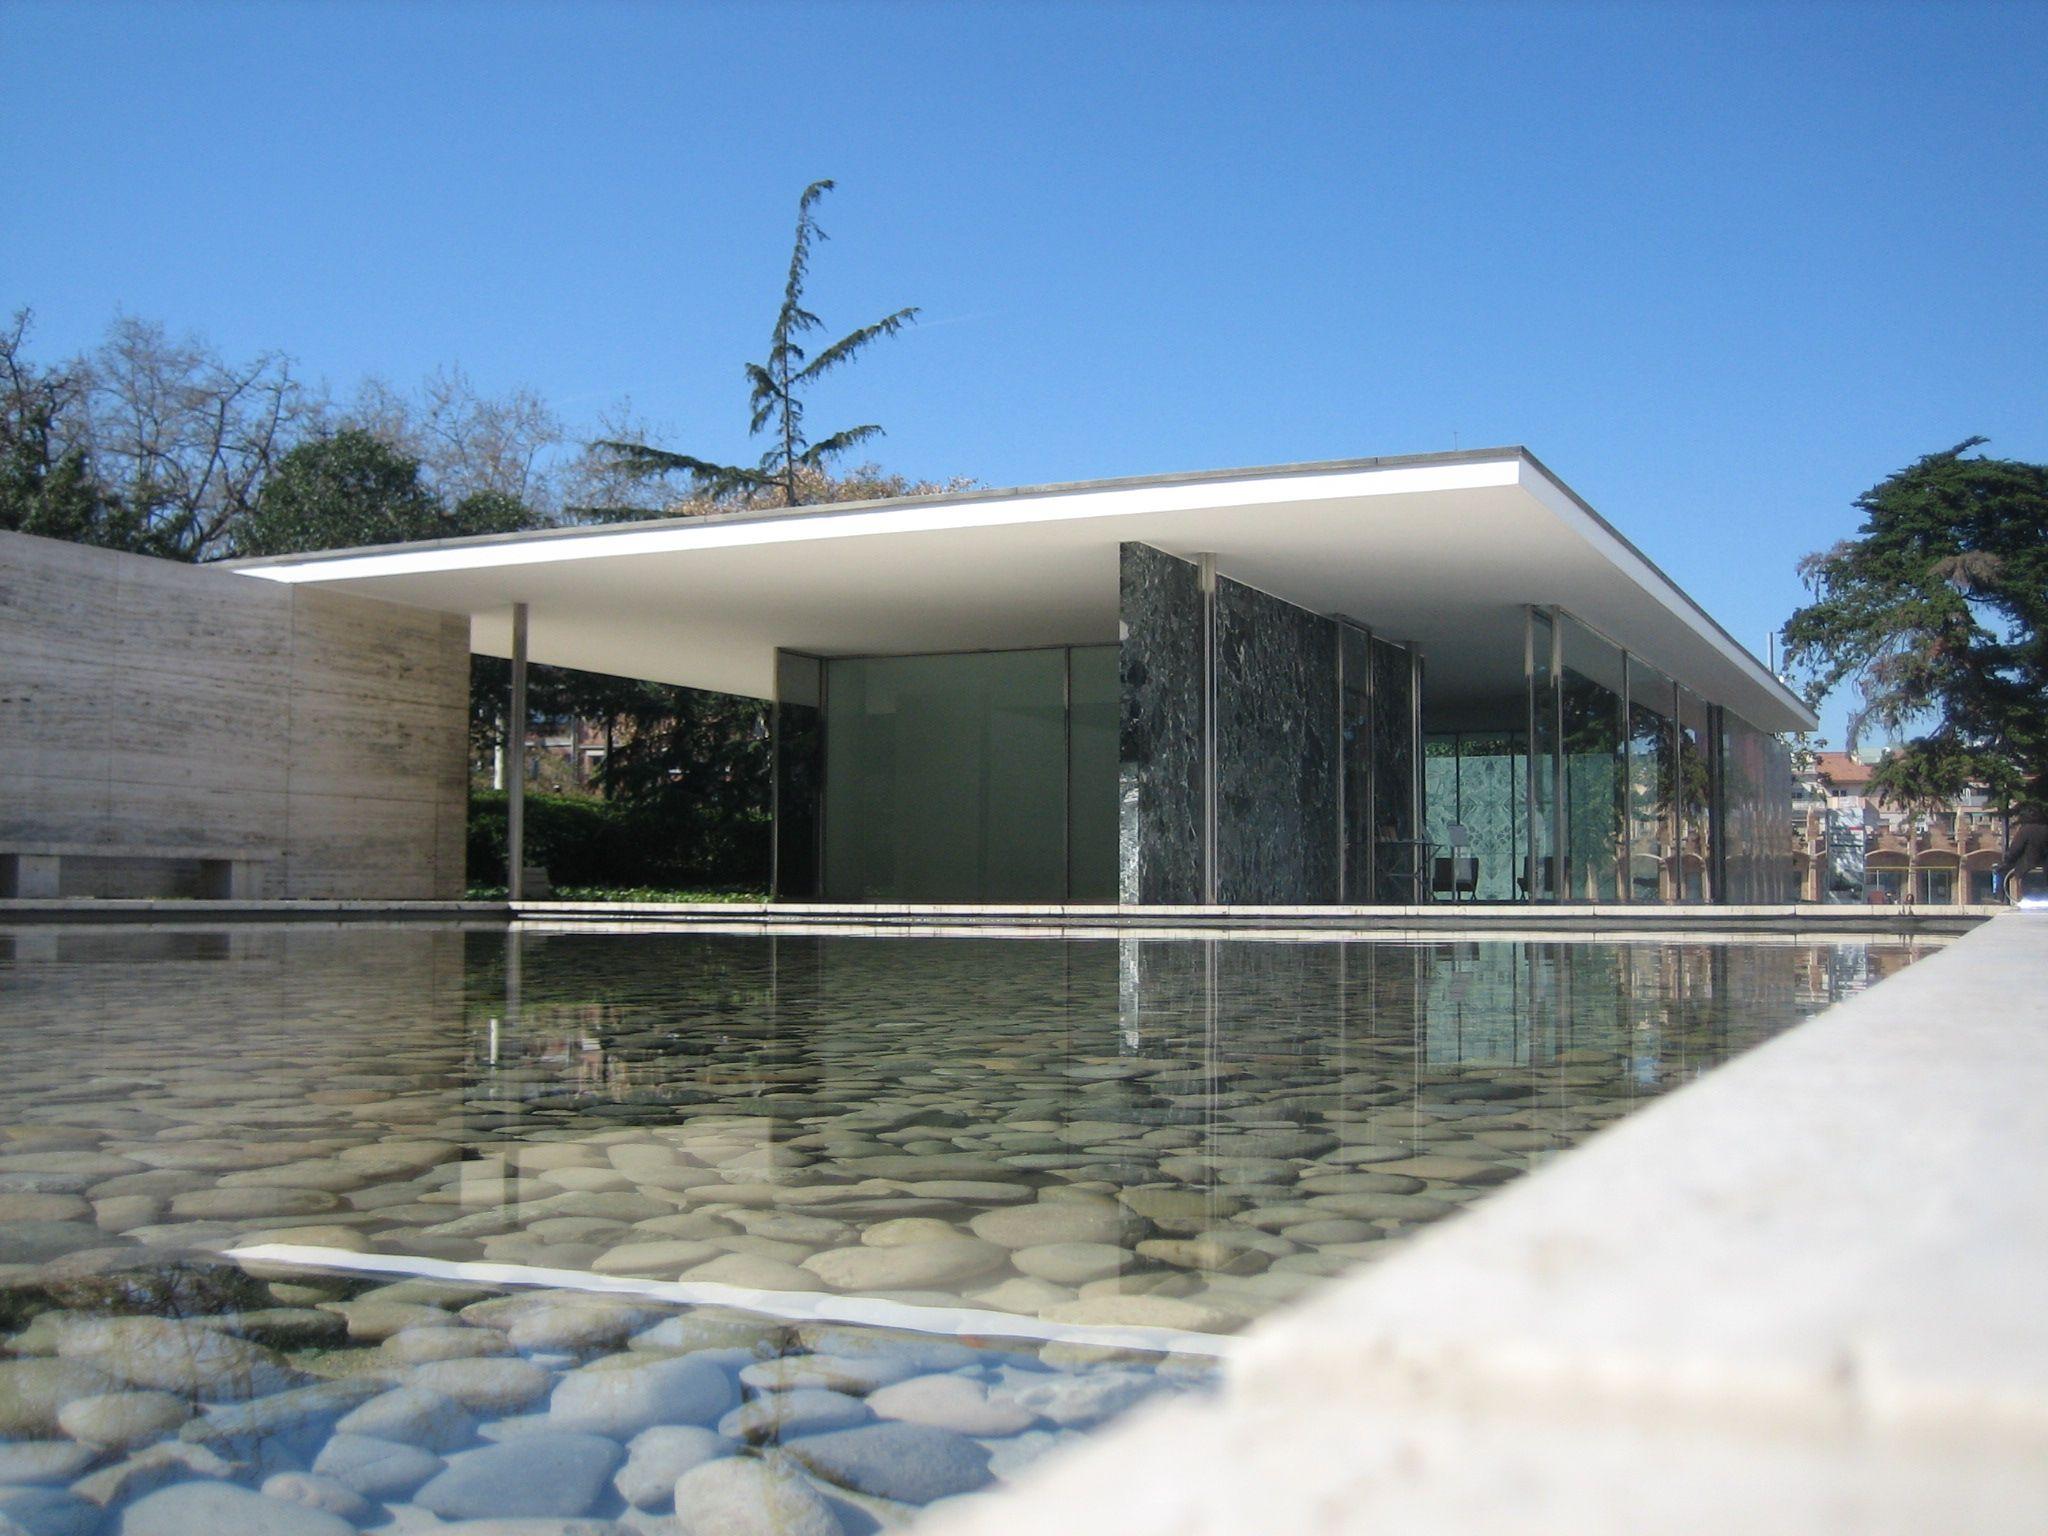 Pavilh o de barcelona mies van der rohe architecture for Mies van der rohe barcelona